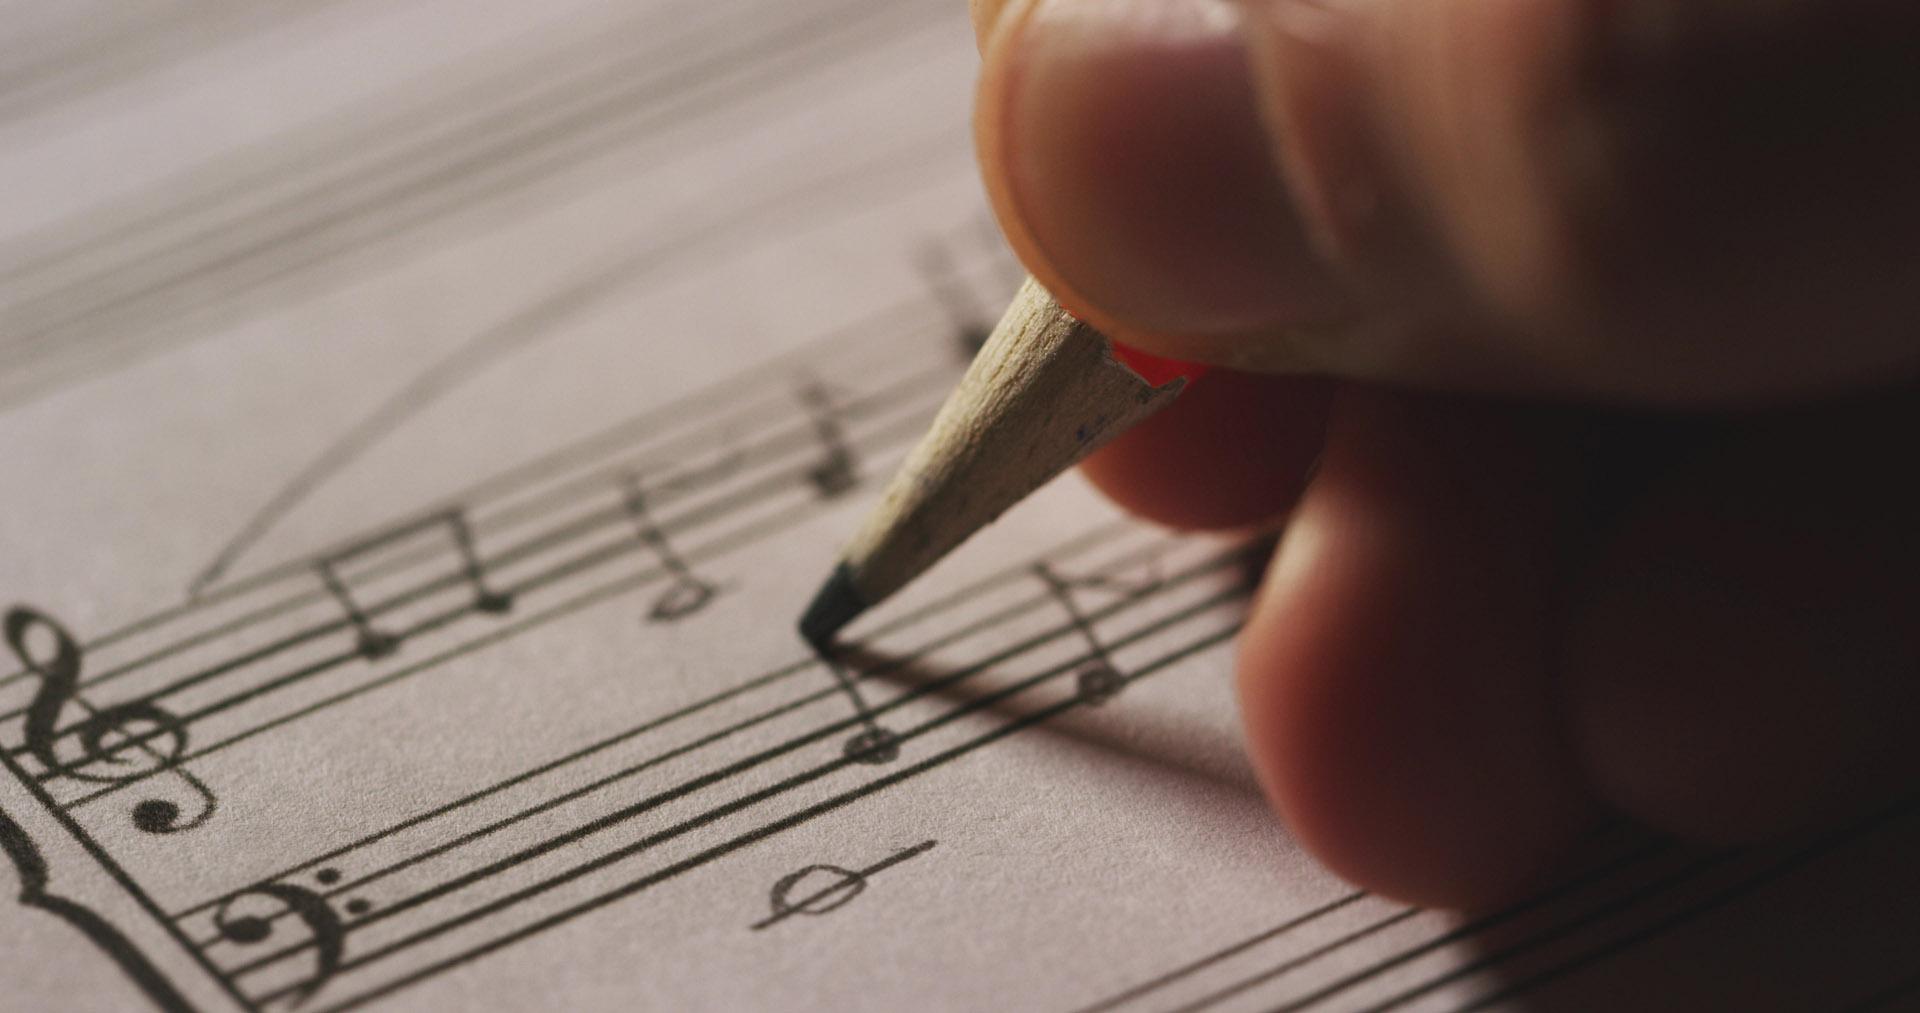 Scoring music for a film on sheet music